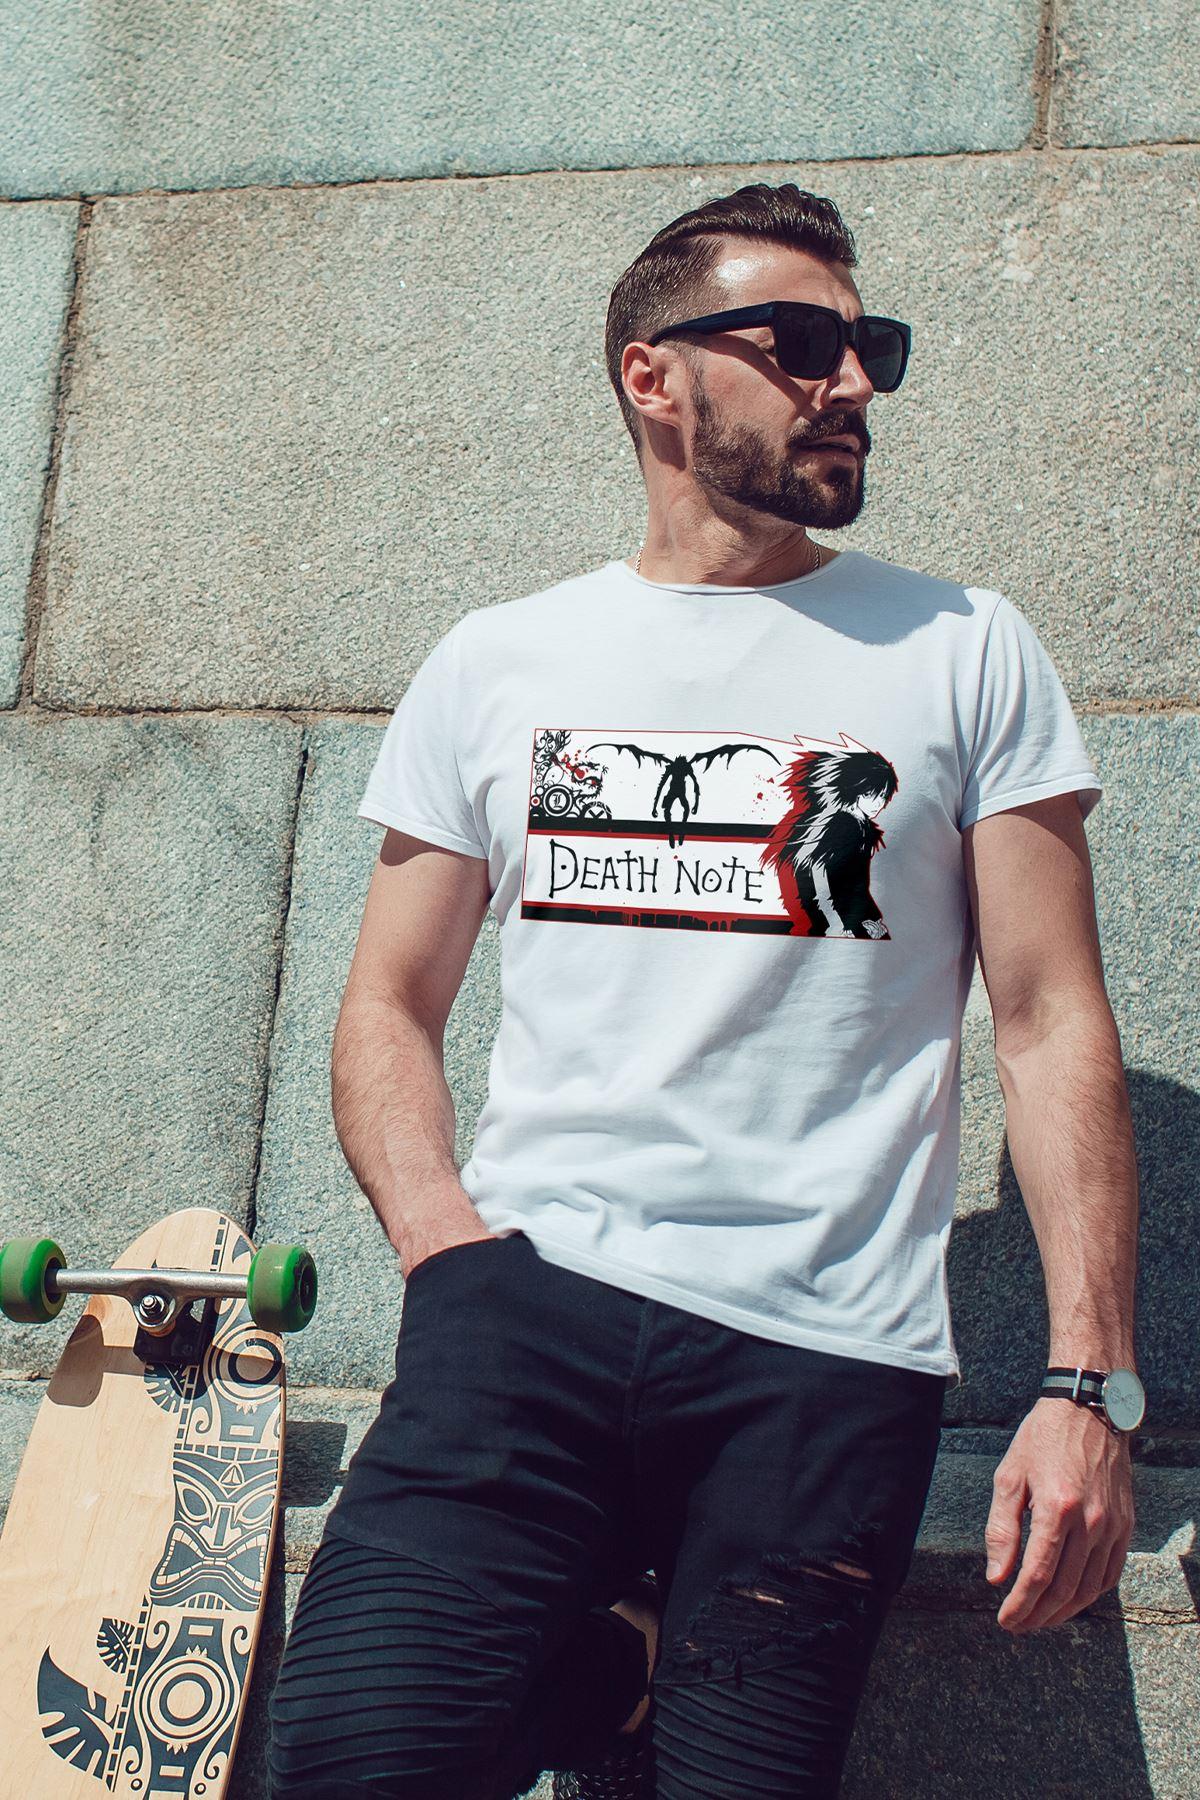 Anime Death Note 04 Beyaz Erkek Tshirt - Tişört